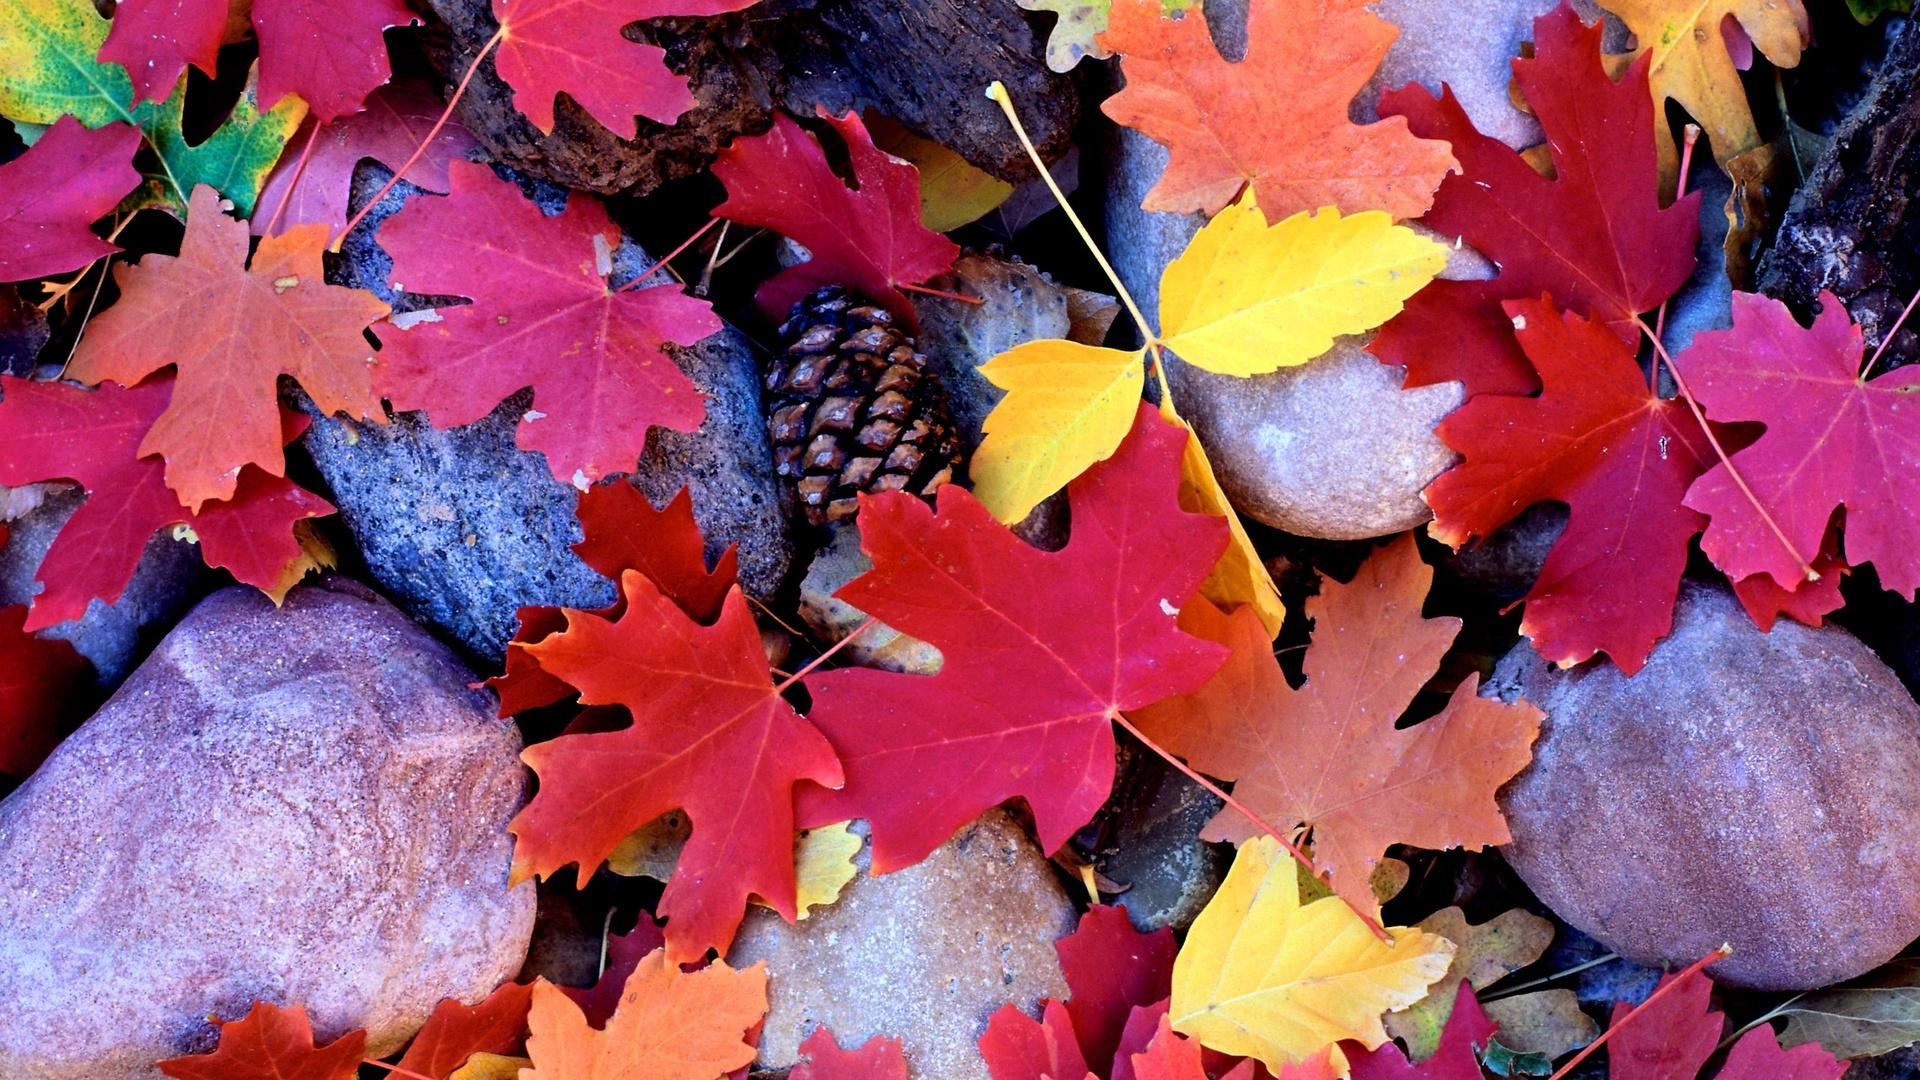 Autumn best picture